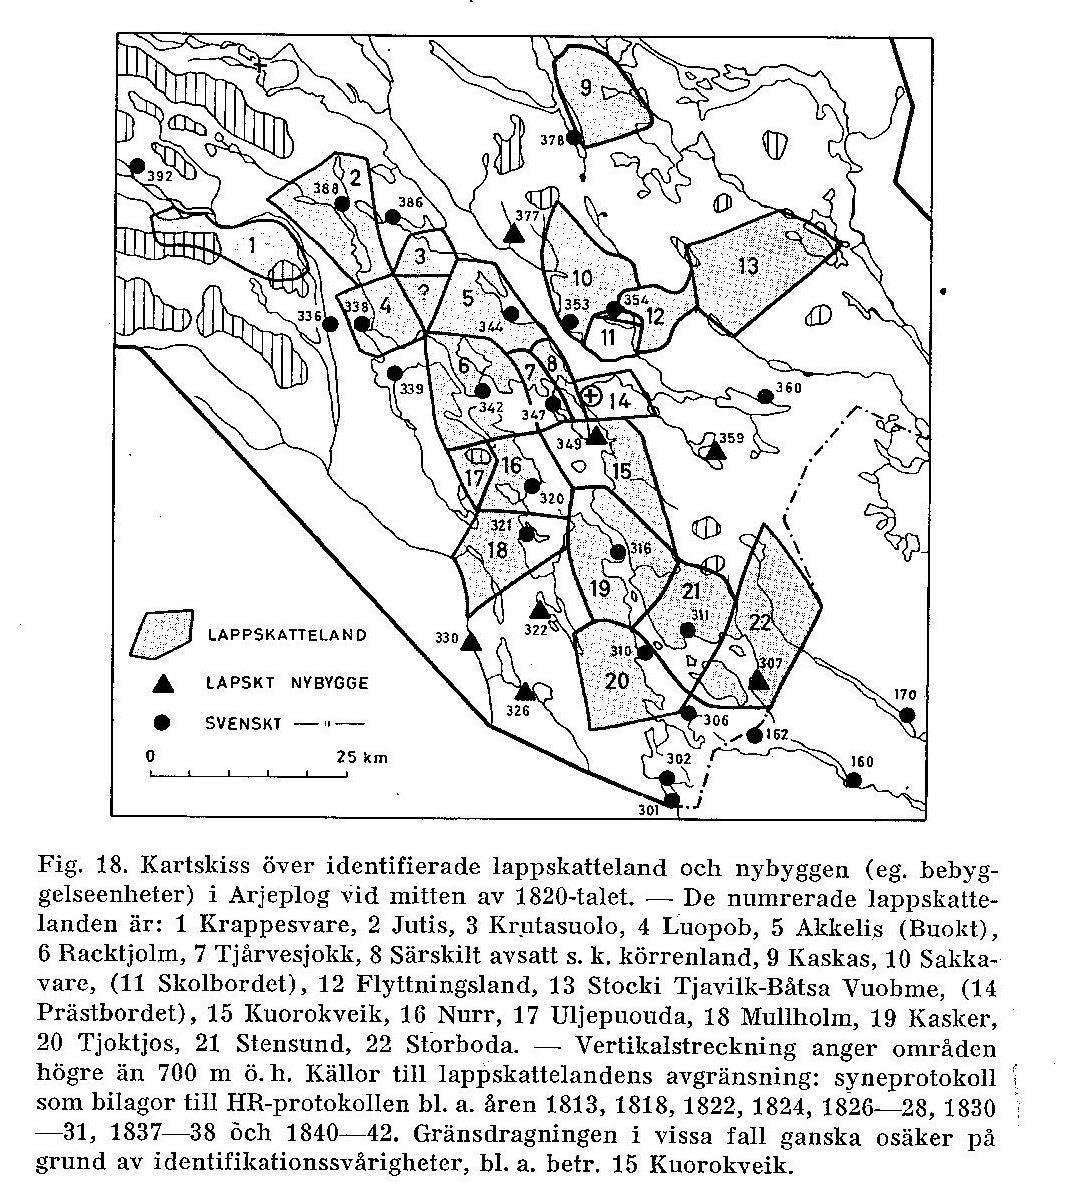 lappskattelanden på geddas karta Nurrholms historia lappskattelanden på geddas karta